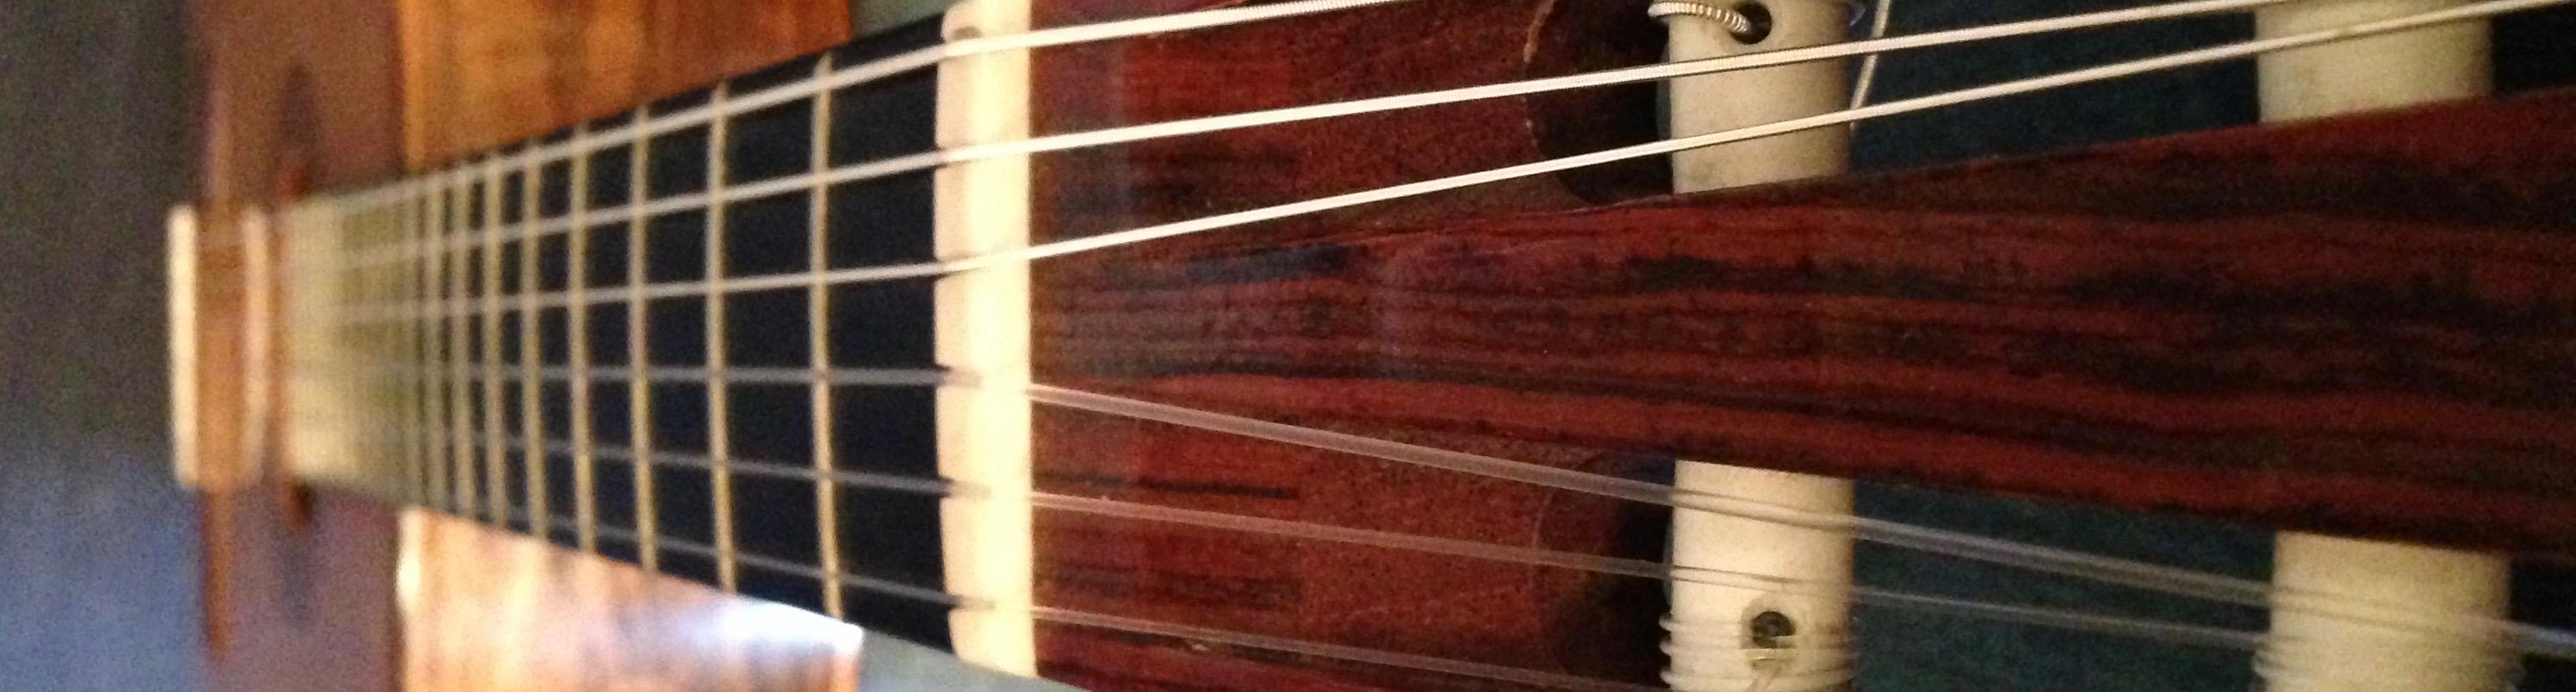 Mein Gitarrenunterricht